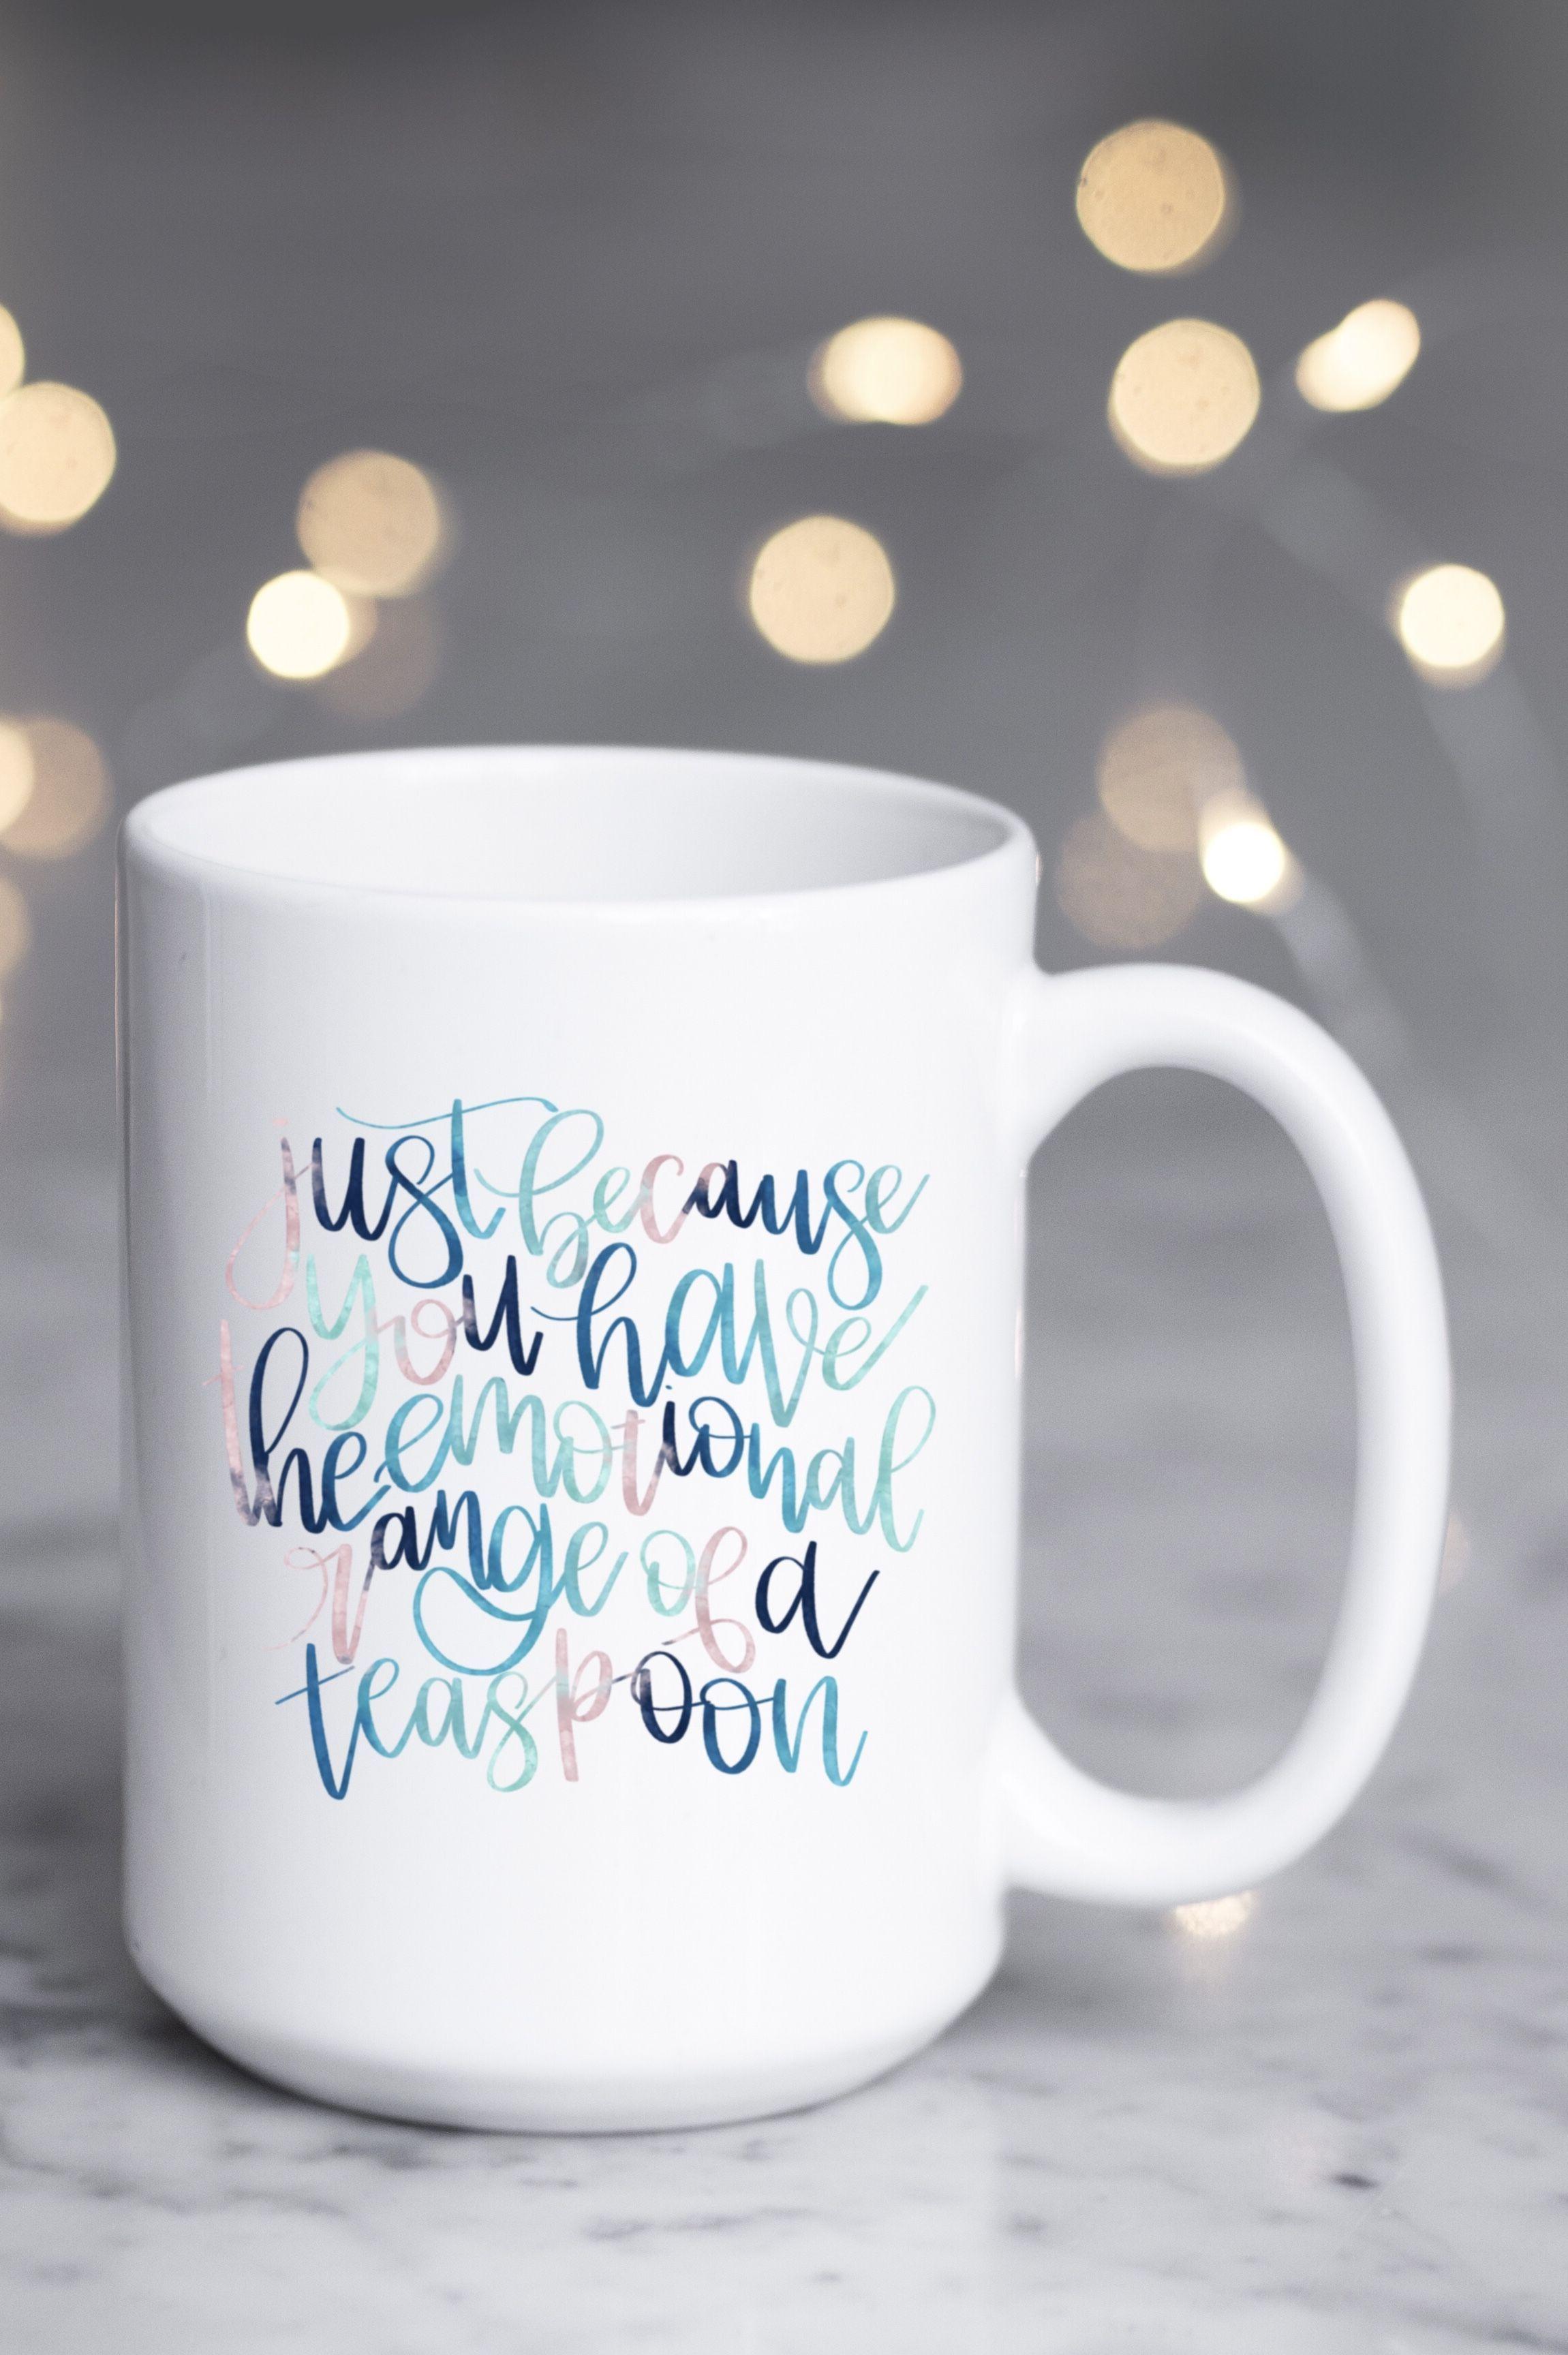 Harry Potter Mug / Hermione Granger Quote / Coffee Mug / Harry ...